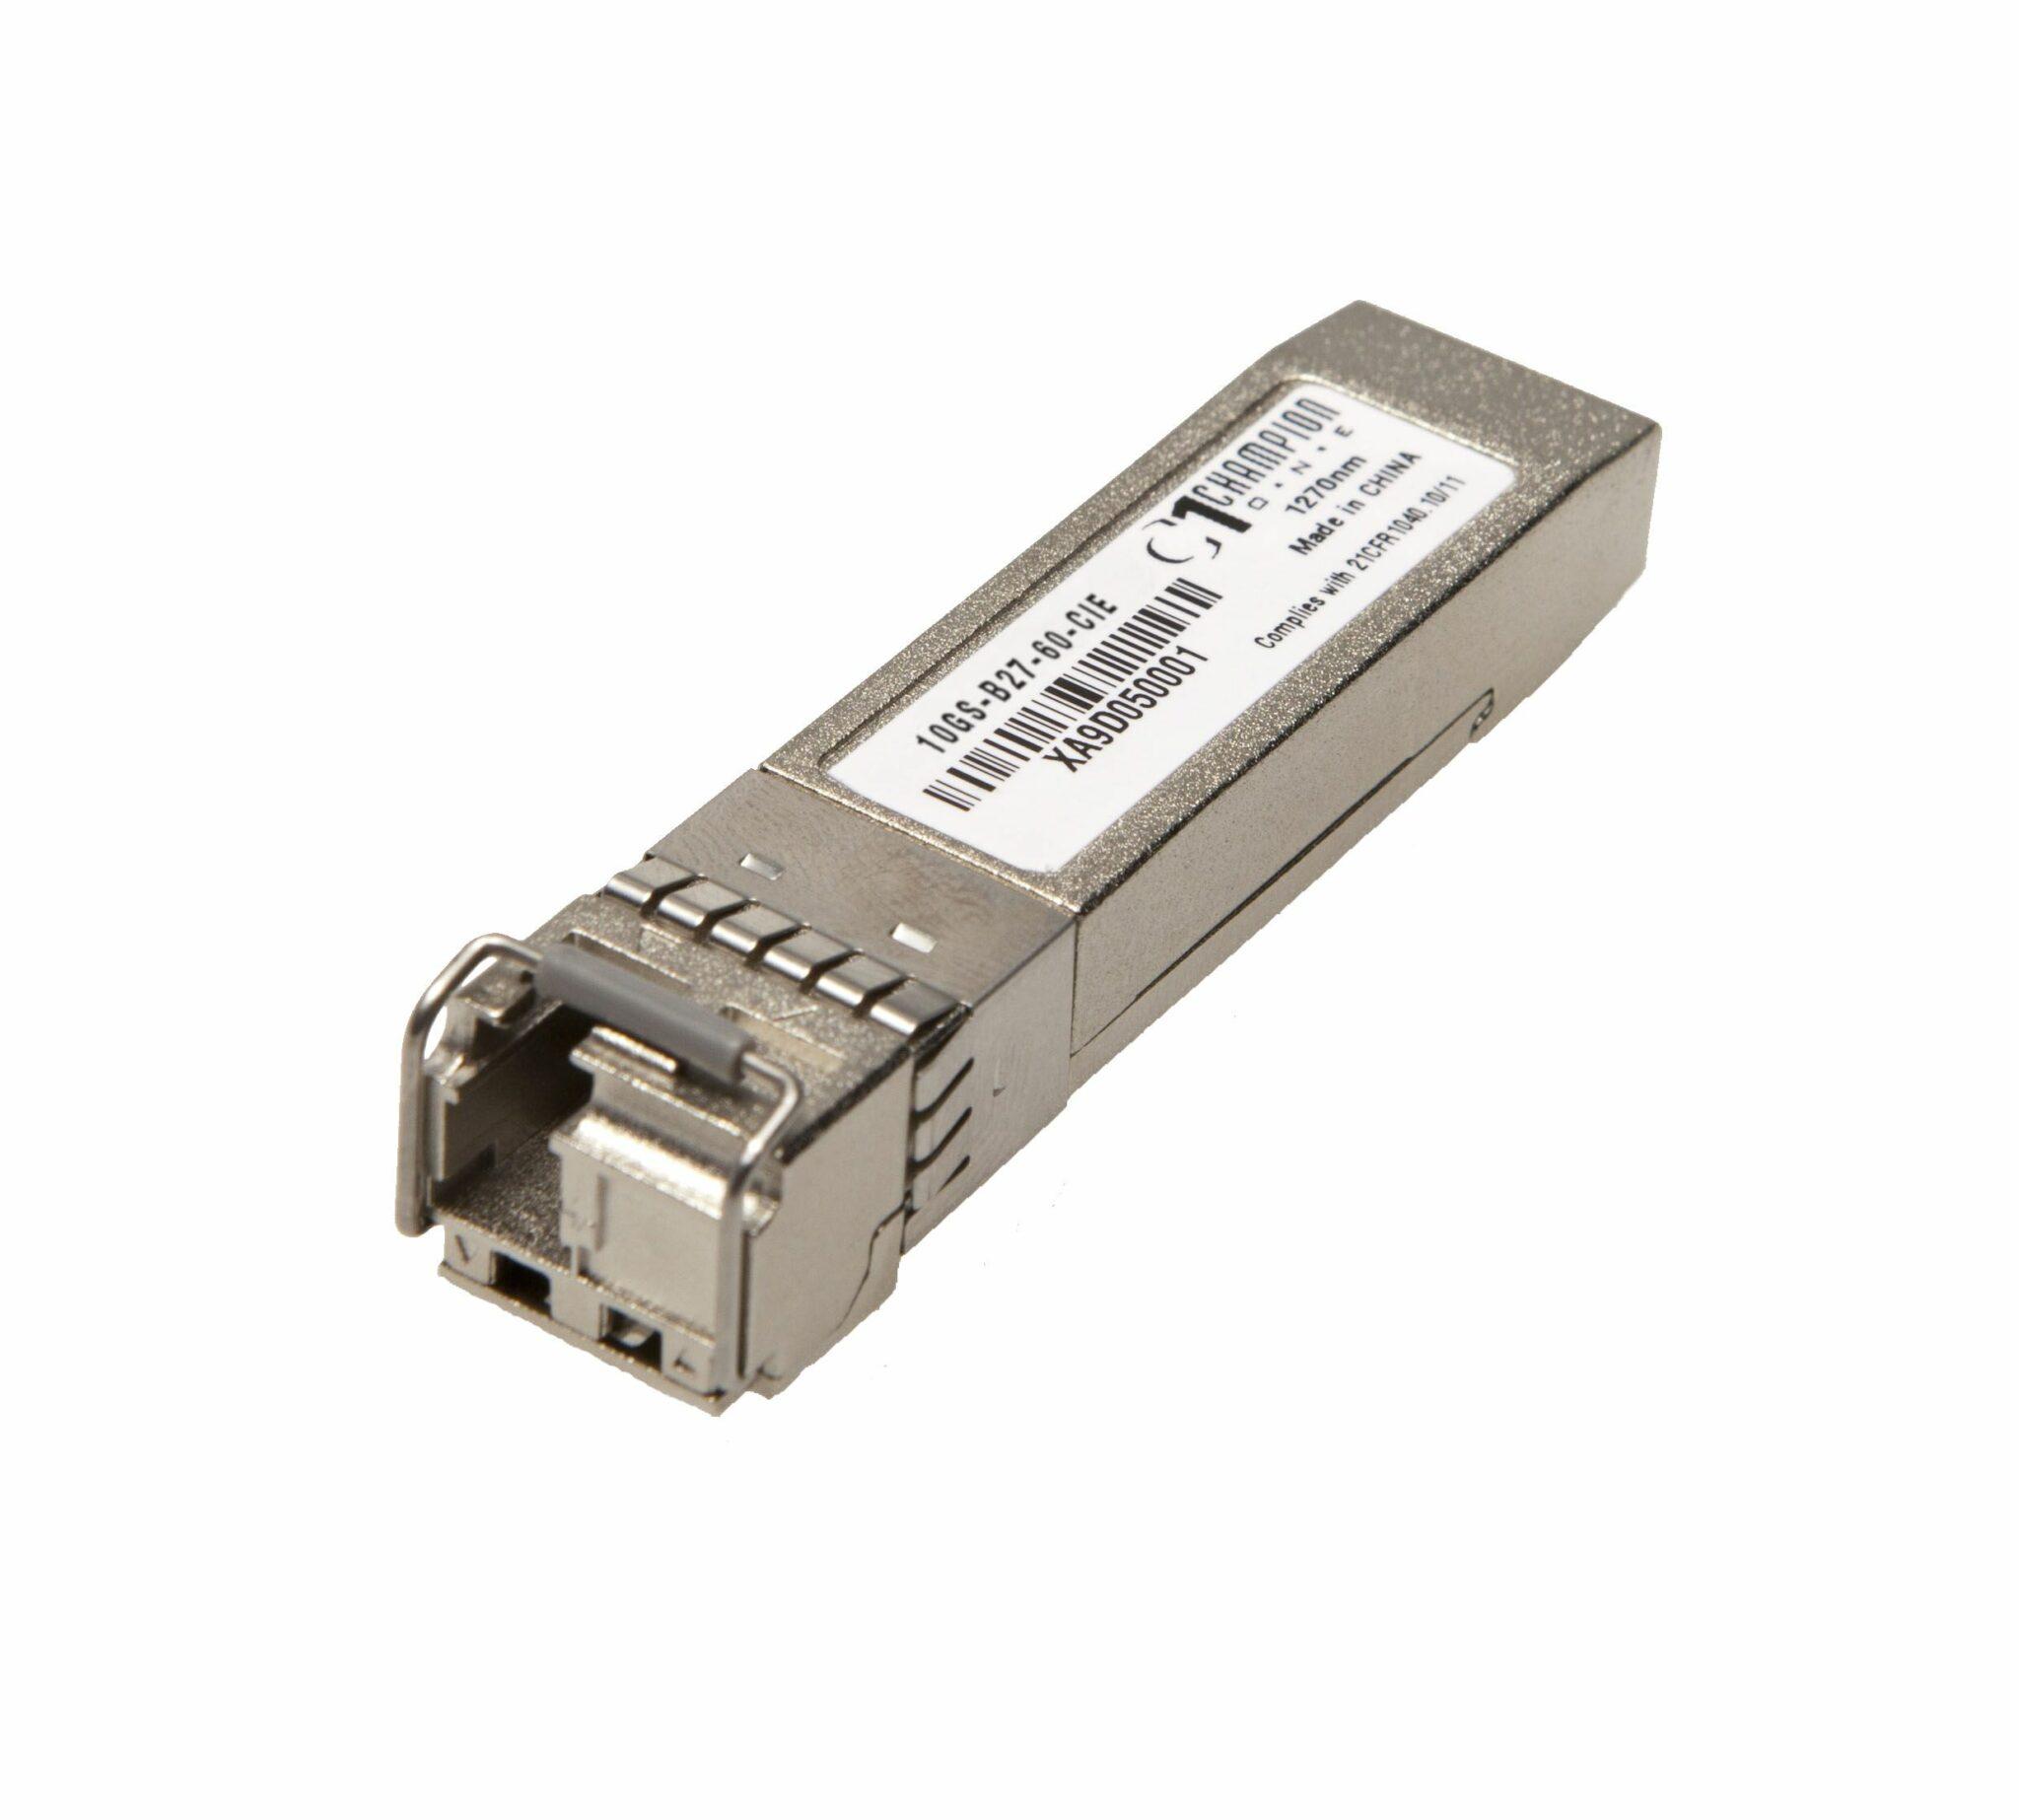 SFP+ SF 10GBase-ER 1270nm 60km, Ciena compatible